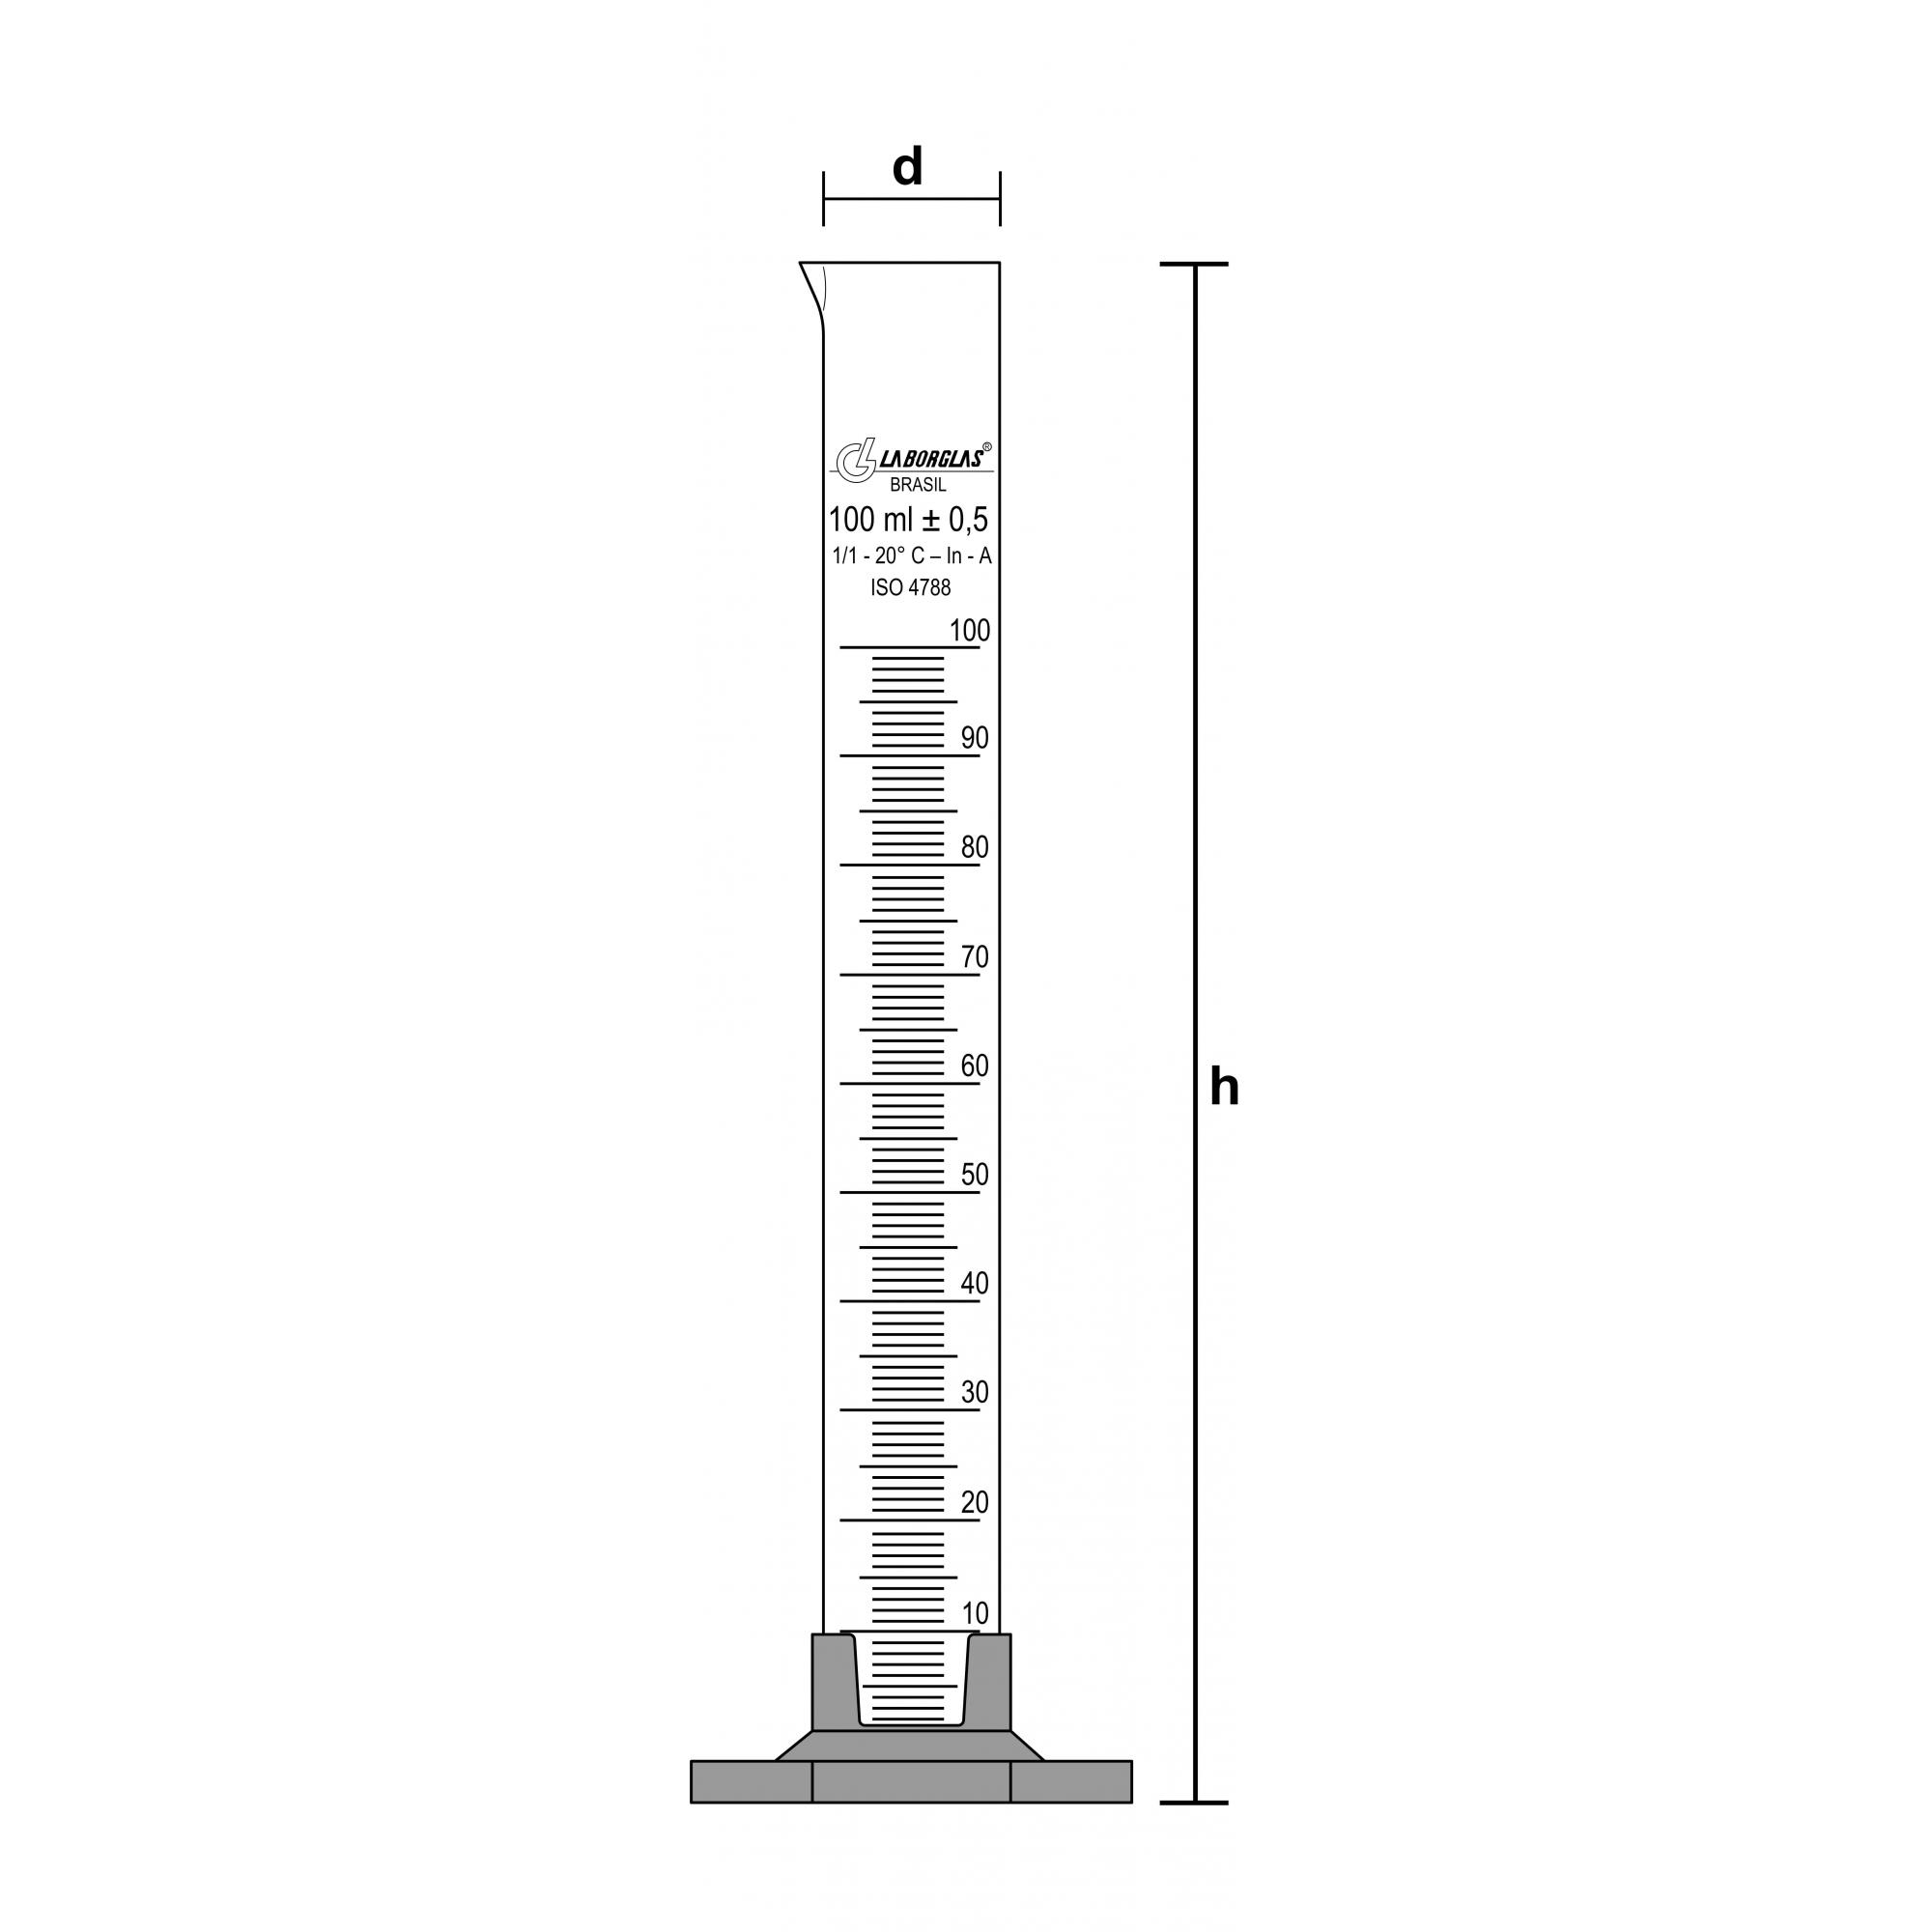 PROVETA GRADUADA BASE HEXAGONAL DE POLIPROPILENO CLASSE A 1000 ML - Laborglas - Cód. 9138754